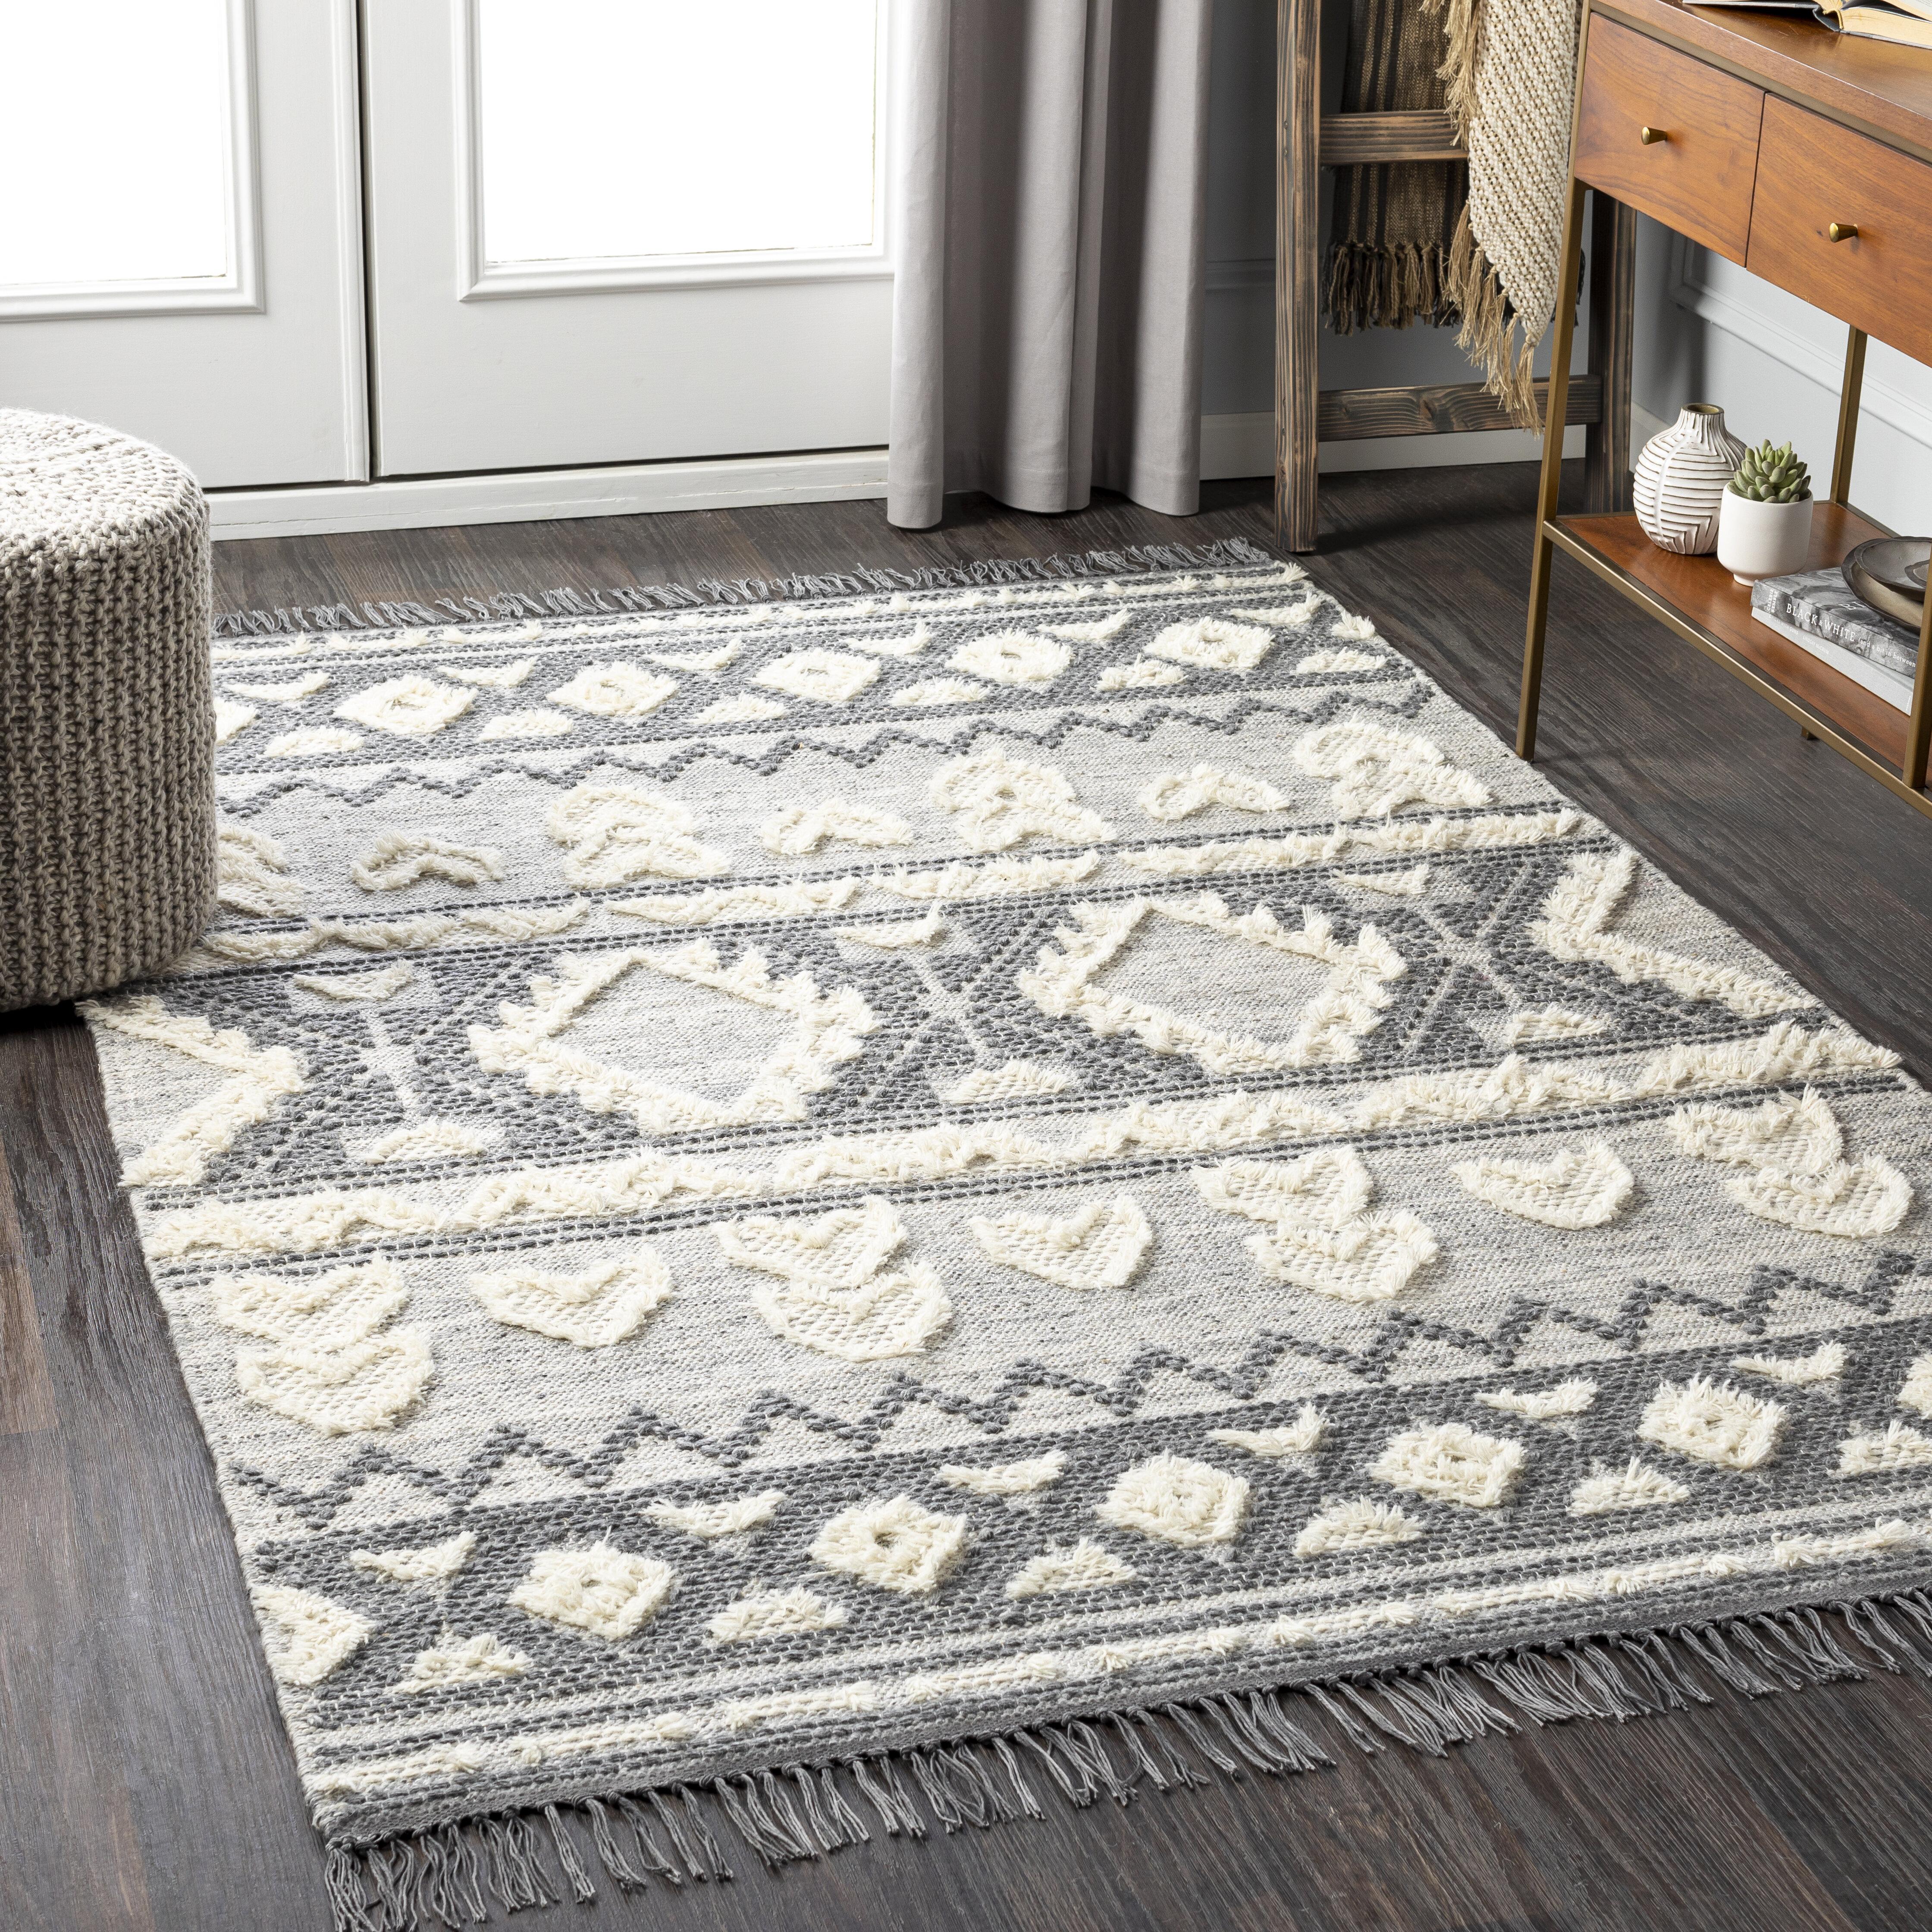 Cypres Geometric Hand Tufted Wool Beige Gray Brown Area Rug Allmodern